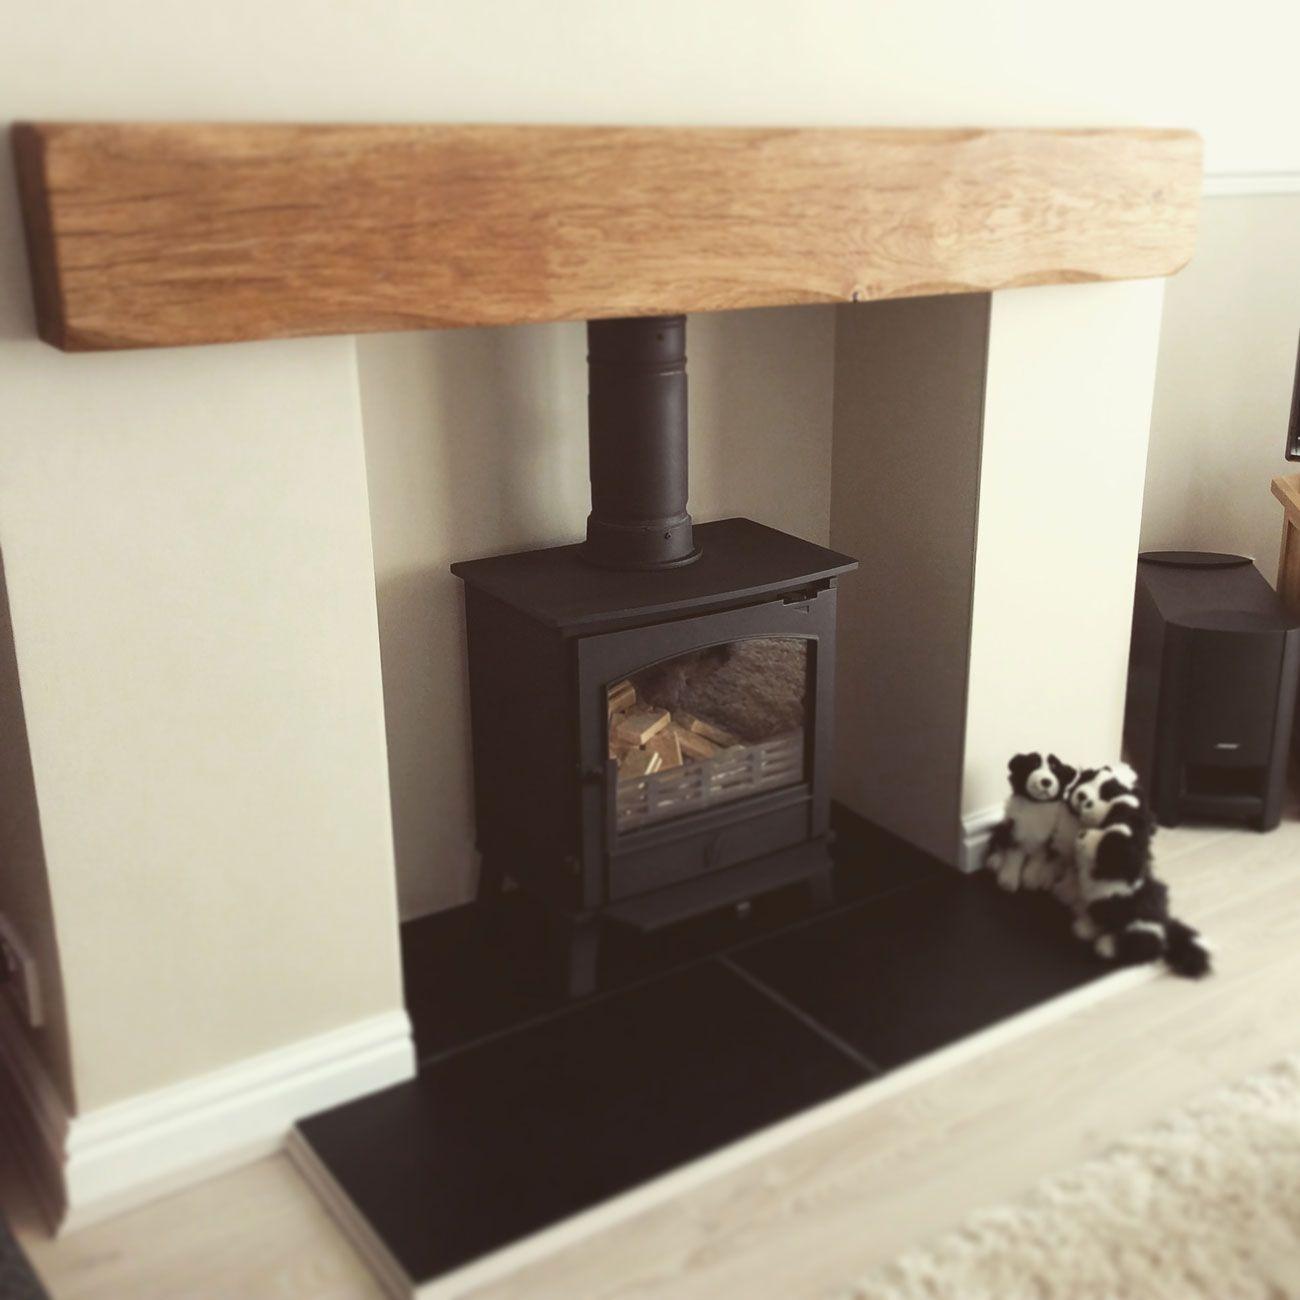 OAK BEAM FIREPLACE MANTLE Rustic Timber Shelf Mantelpiece with Brackets /& Oils